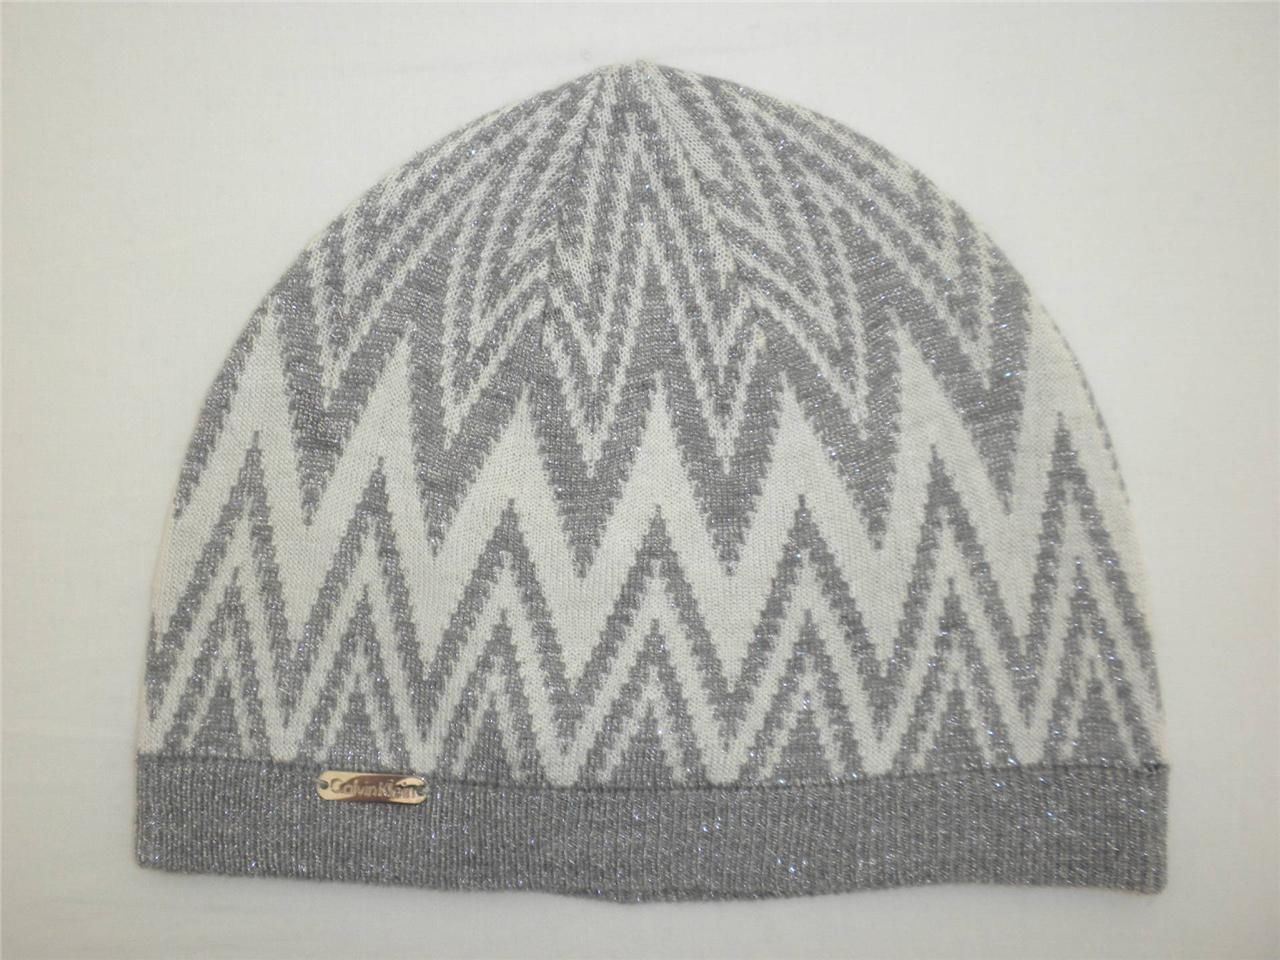 b26a480ec1c Calvin Klein Beanie Hat Metallic Silver   White Chevron Zig Zag Pattern  40  NEW -  13.86